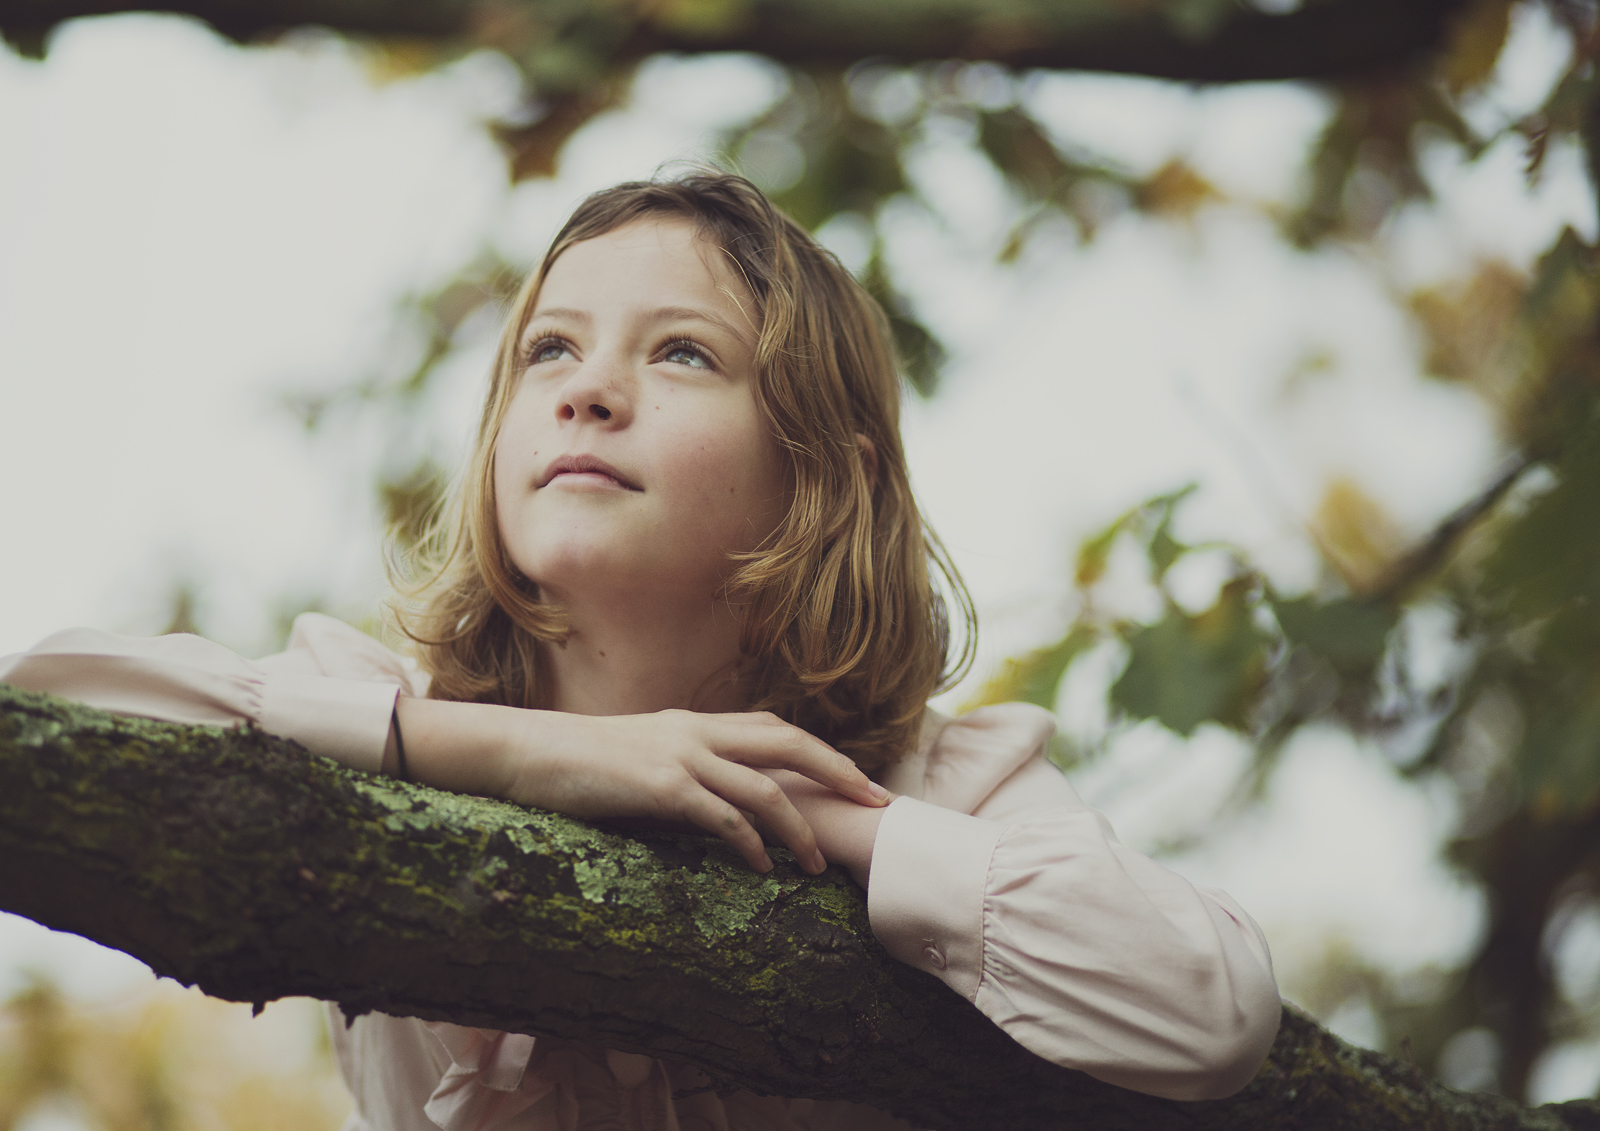 Little girl daydreaming!